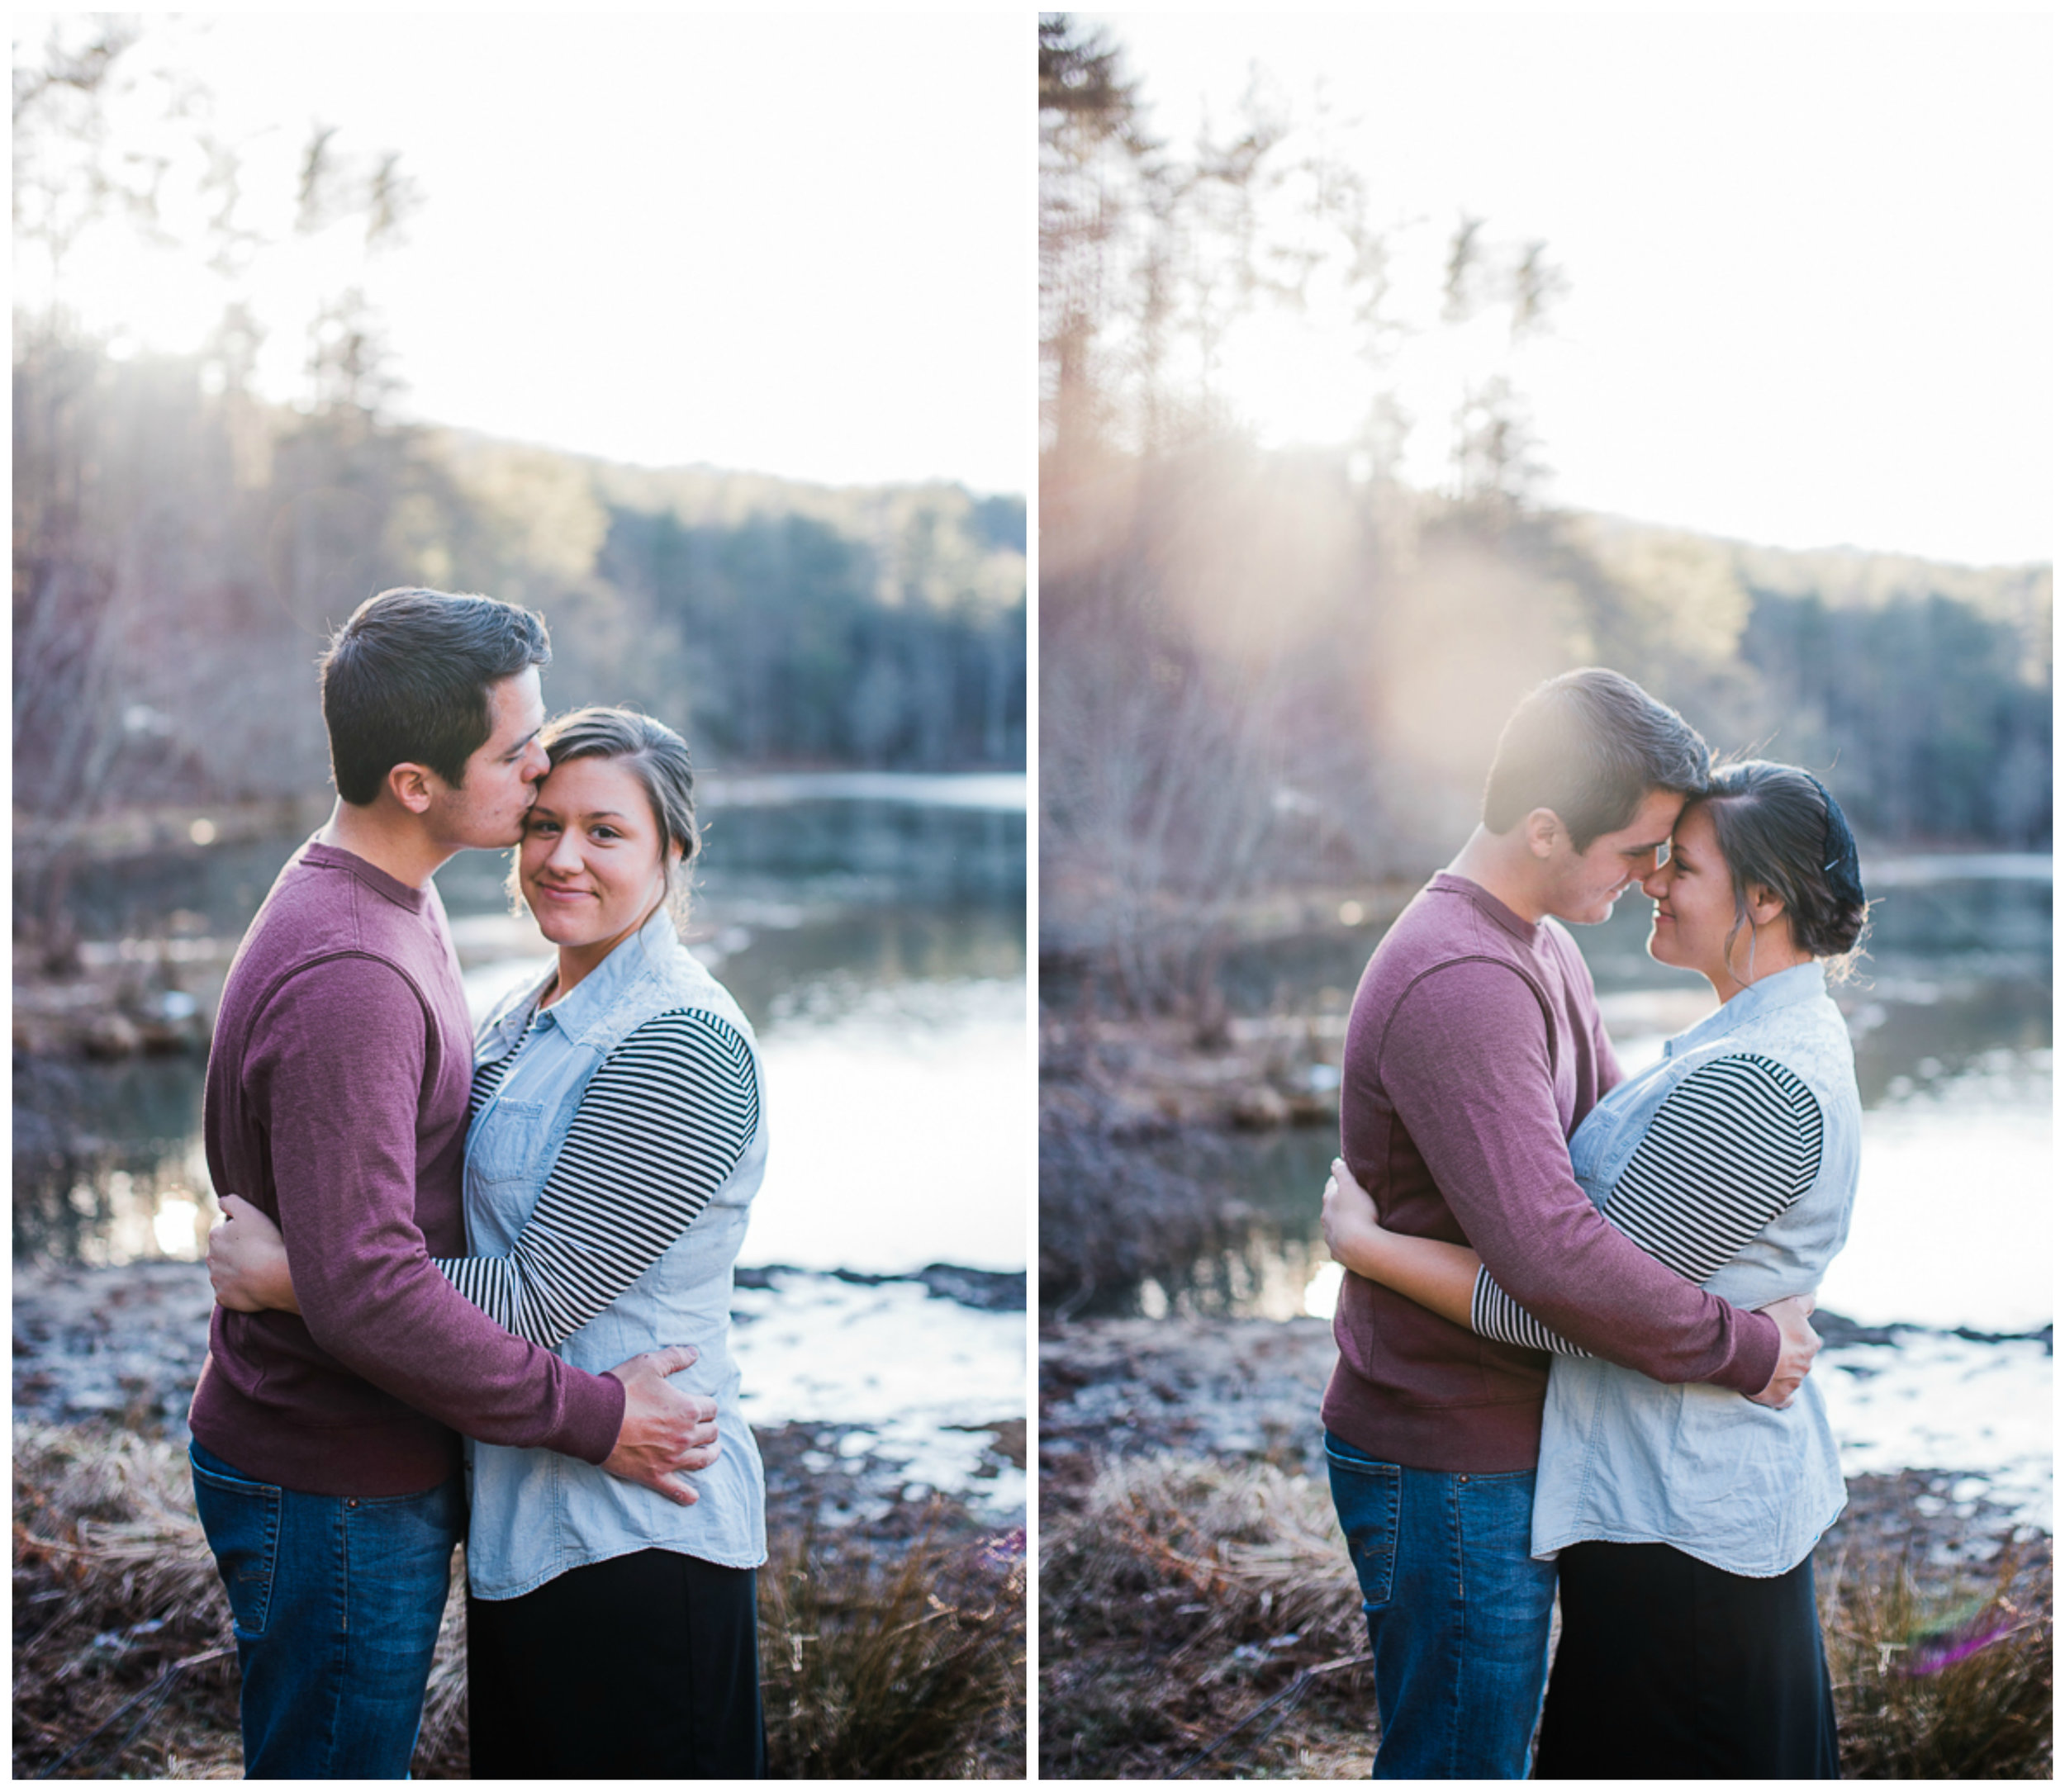 Engagement Portraits, Mountain Engagement, Winter Engagement 2.jpg